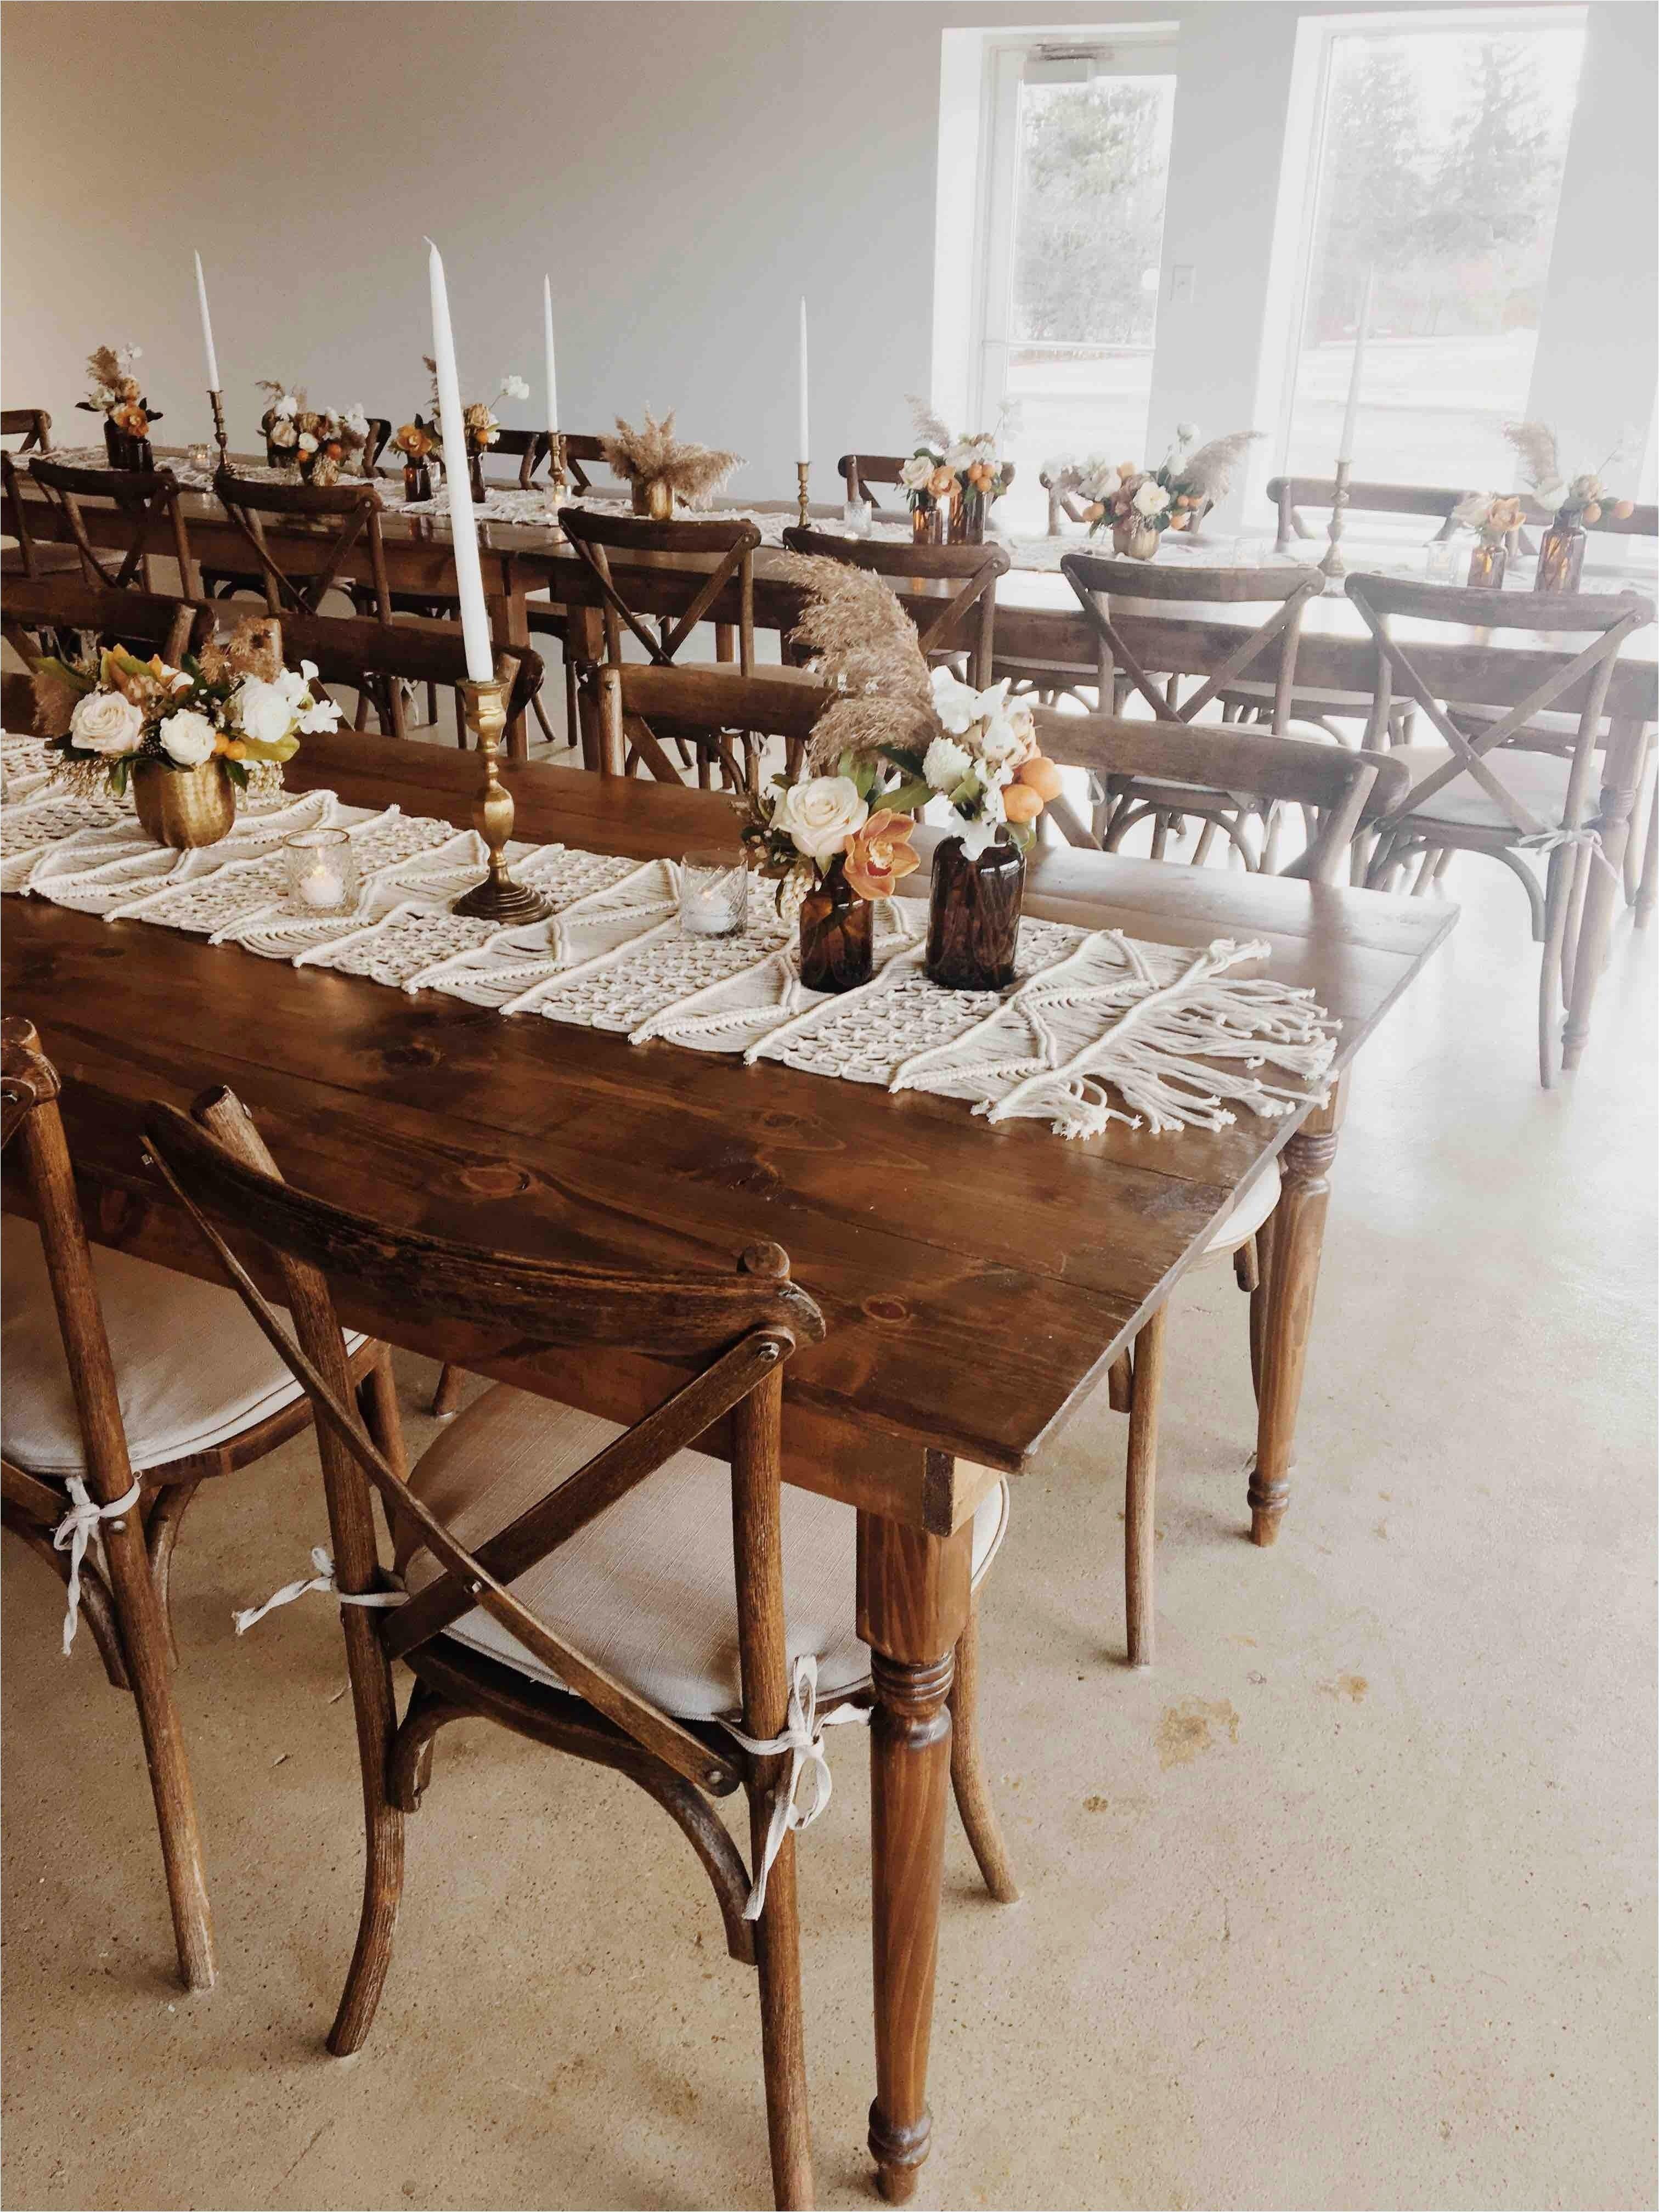 Mid Century Design Best Century sofa 0d Archives Living Room Ideas Pertaining to the Dump Dining